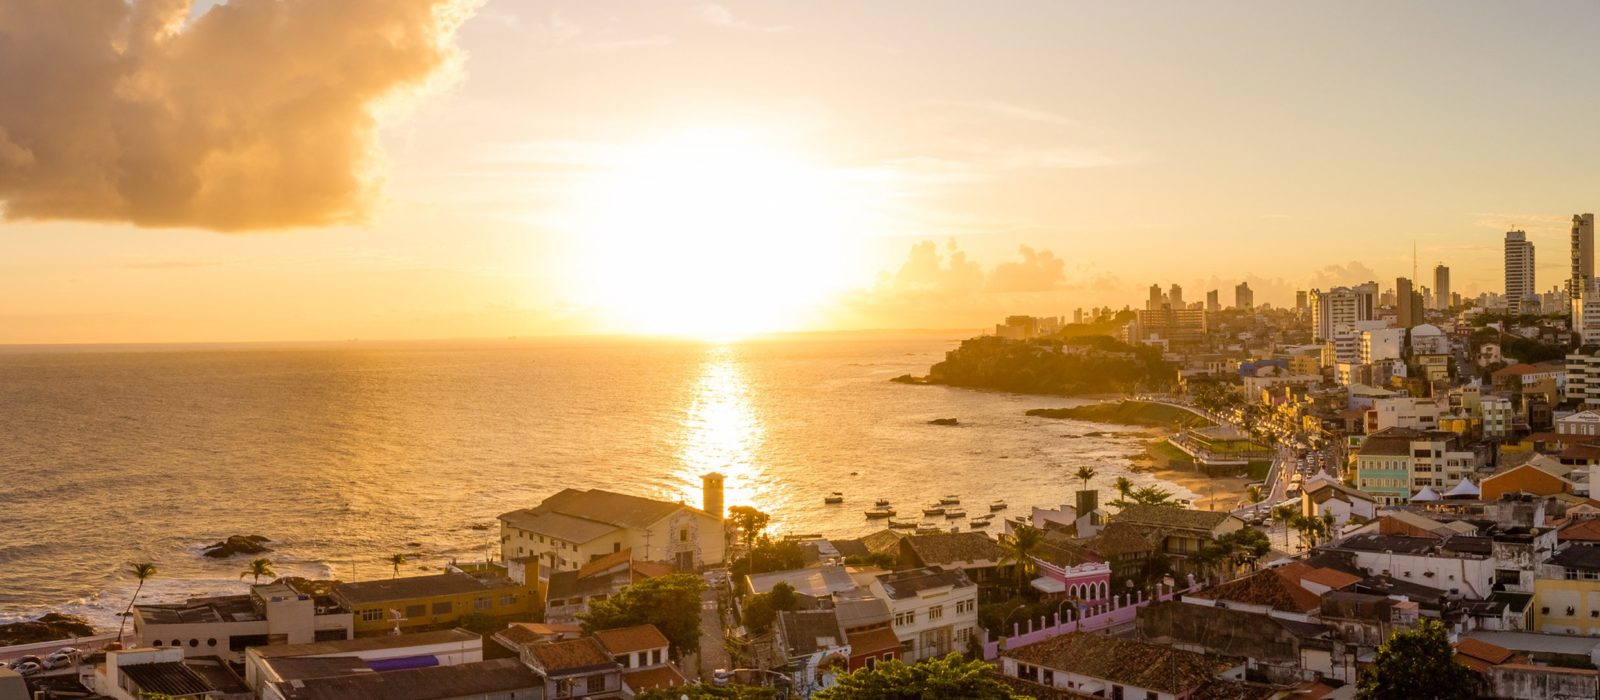 salvador-brazil-sunset